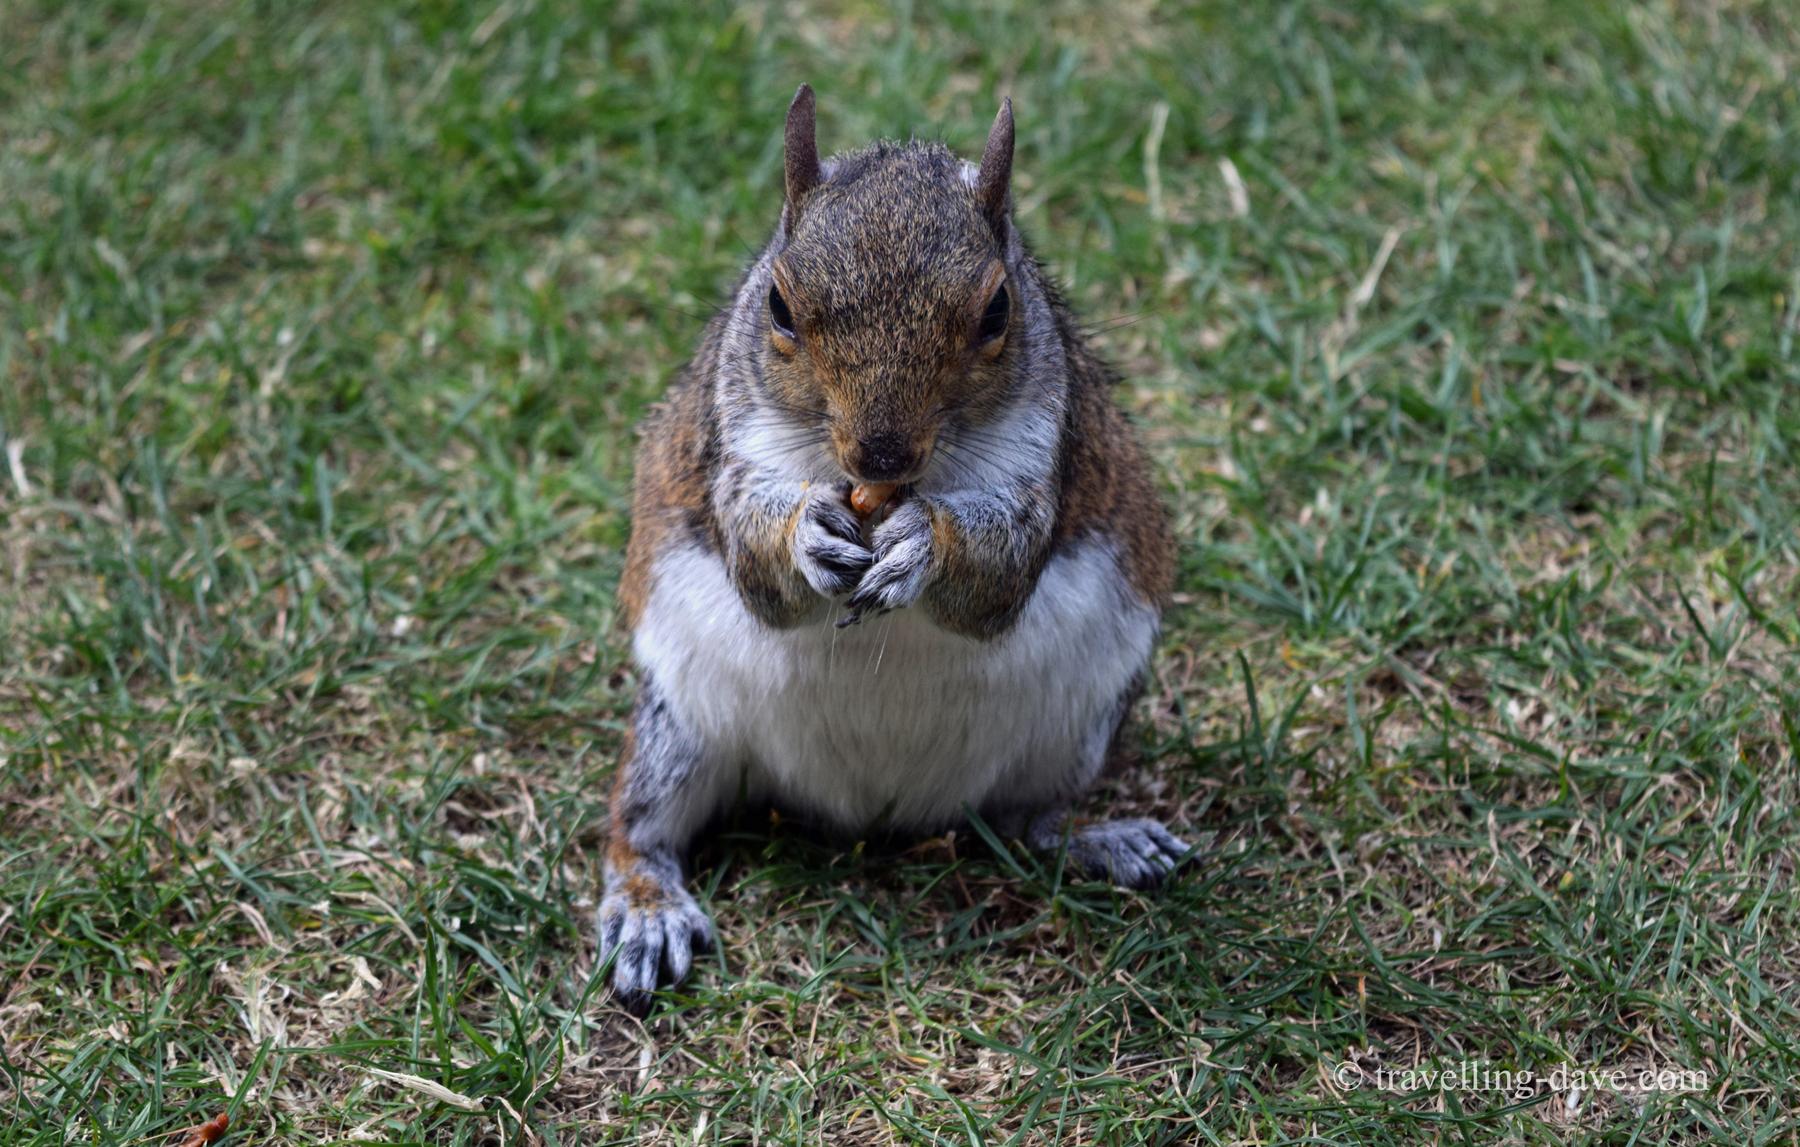 Camera friendly squirrel in London